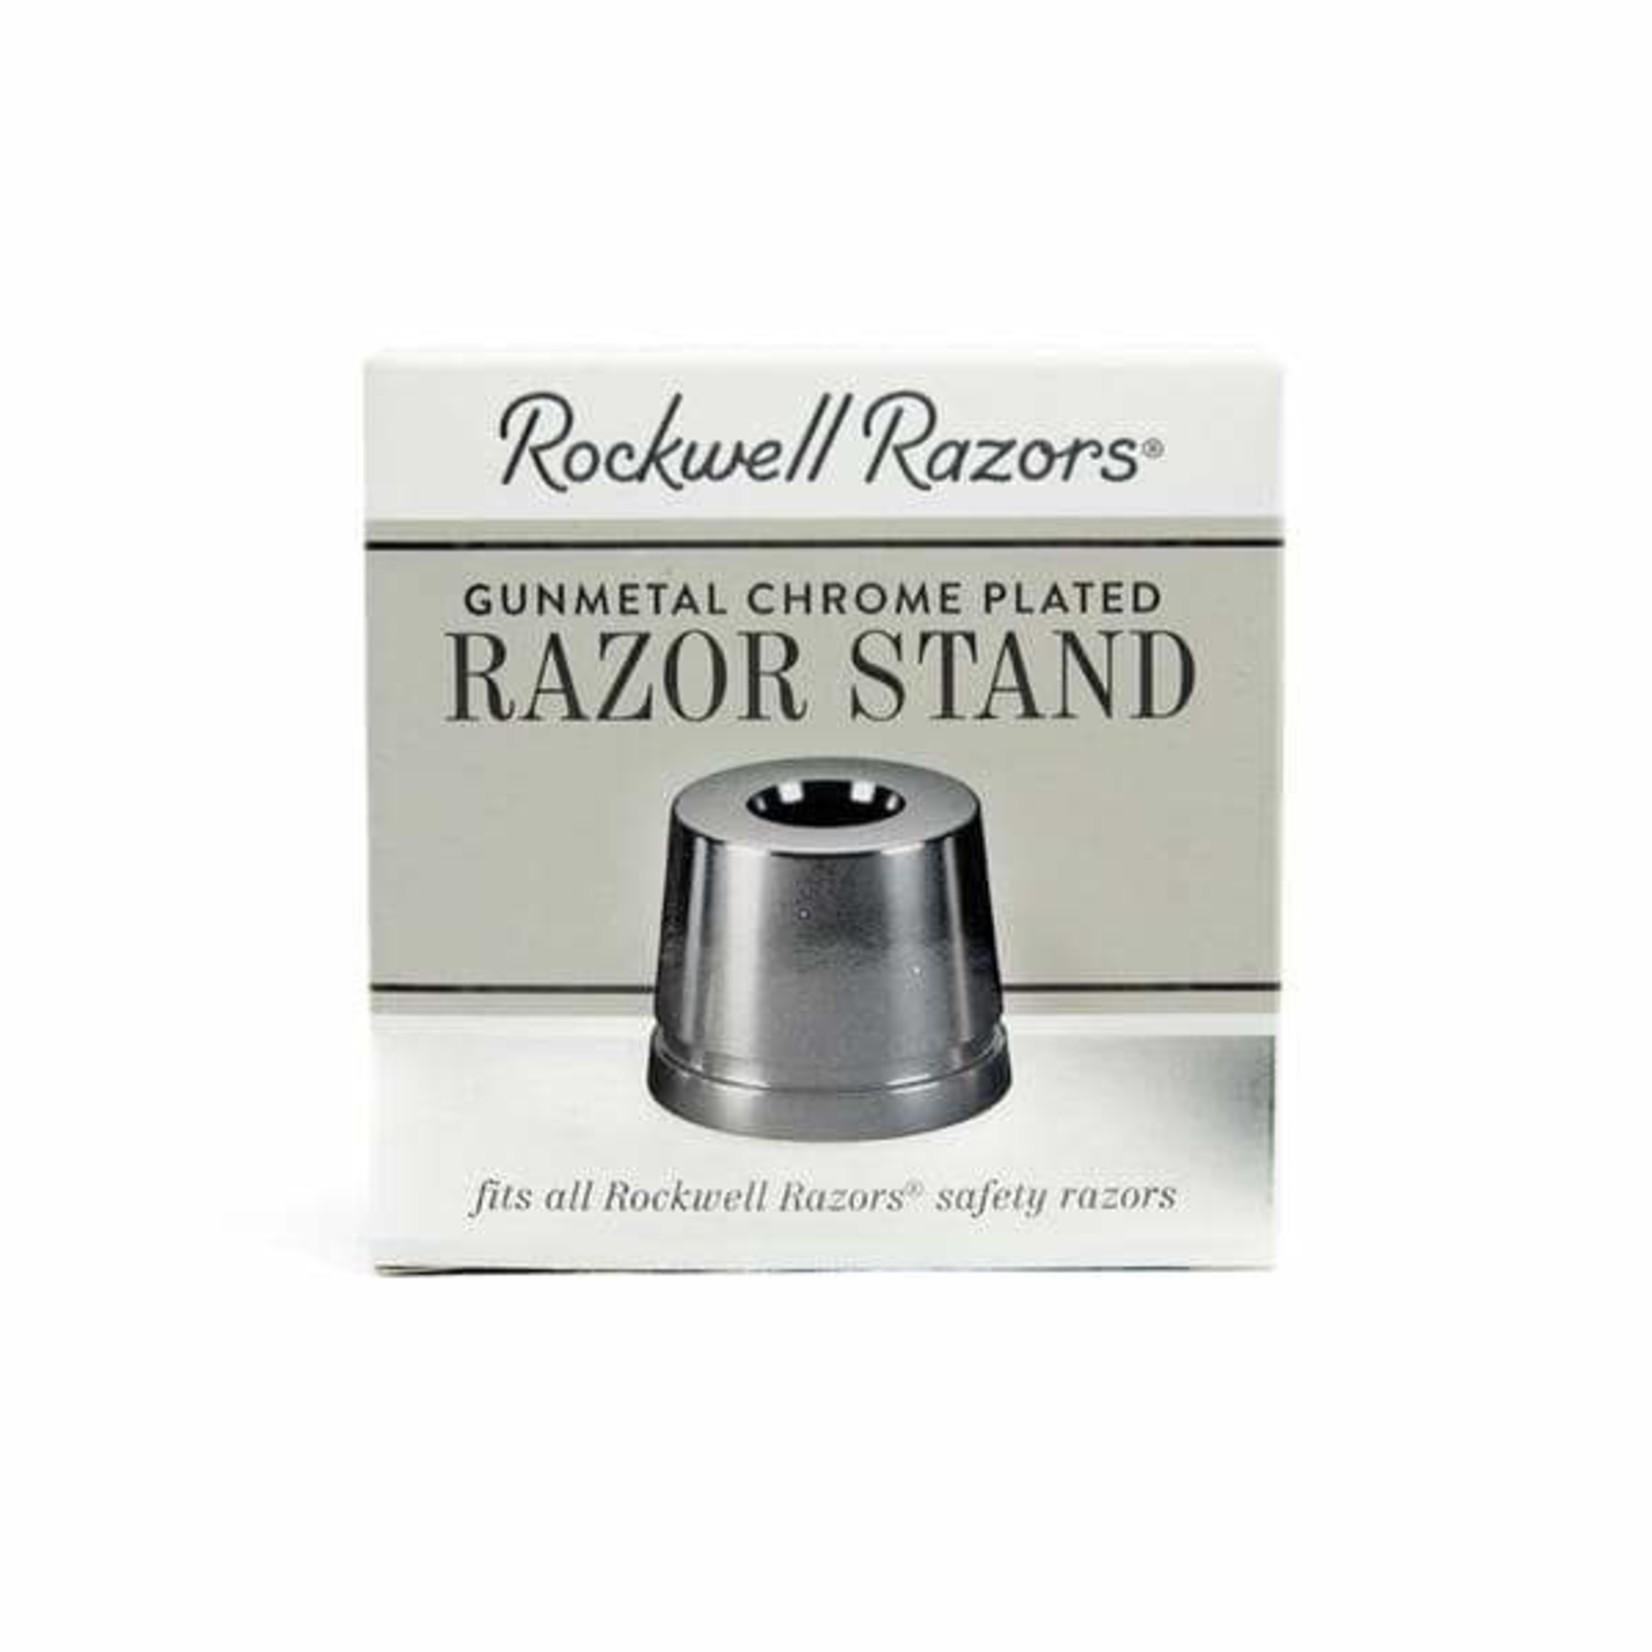 ROCKWELL RAZORS RAZOR STAND